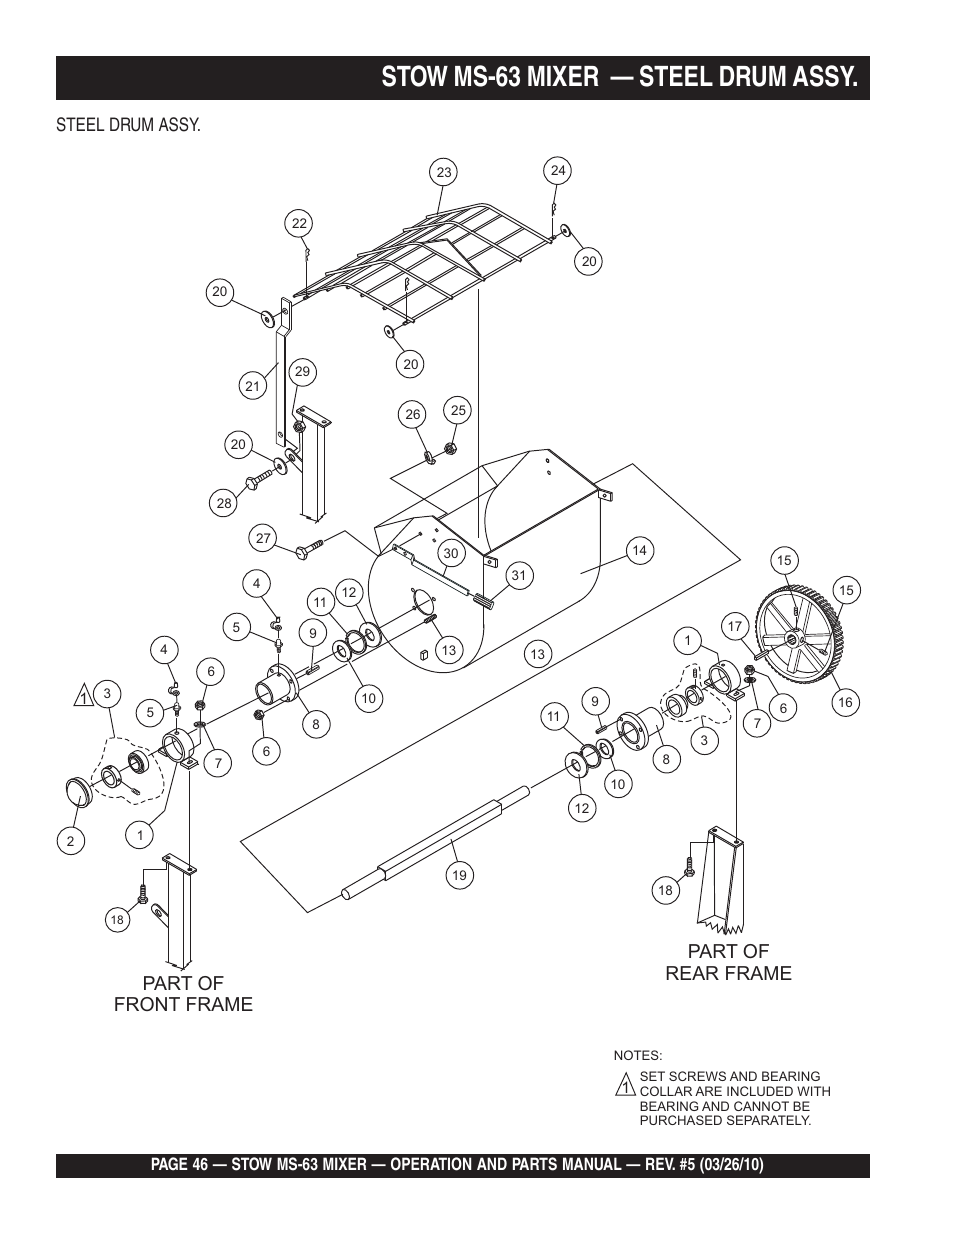 Stow Mixer Parts Diagram - DIY Wiring Diagrams •